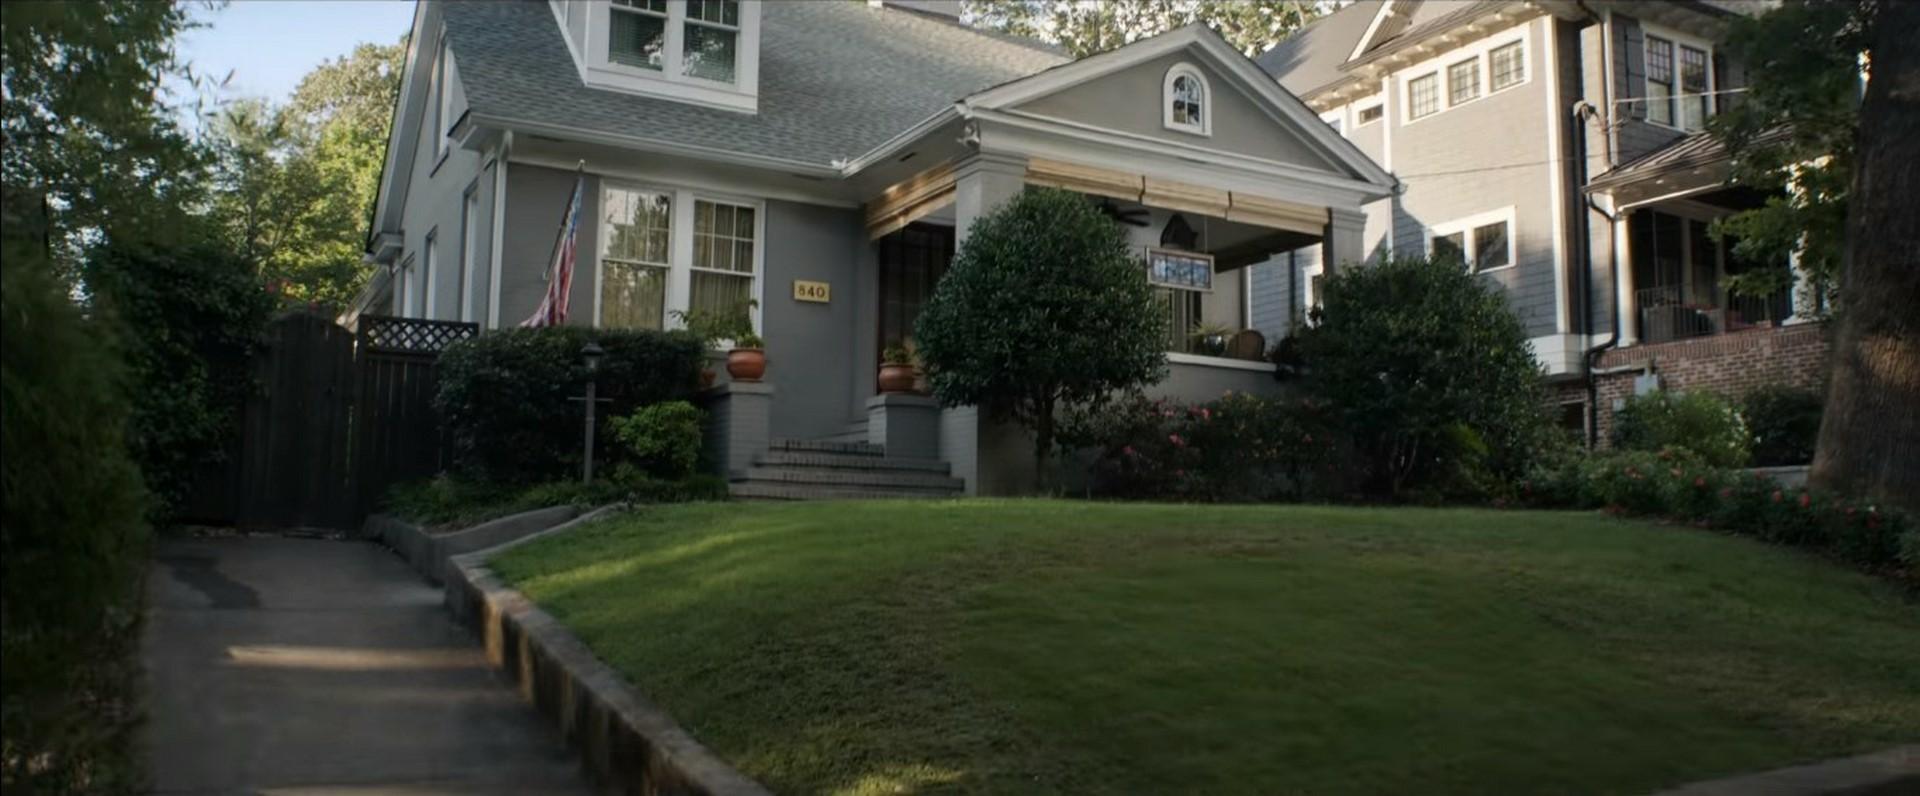 Casa de Margaret Lang